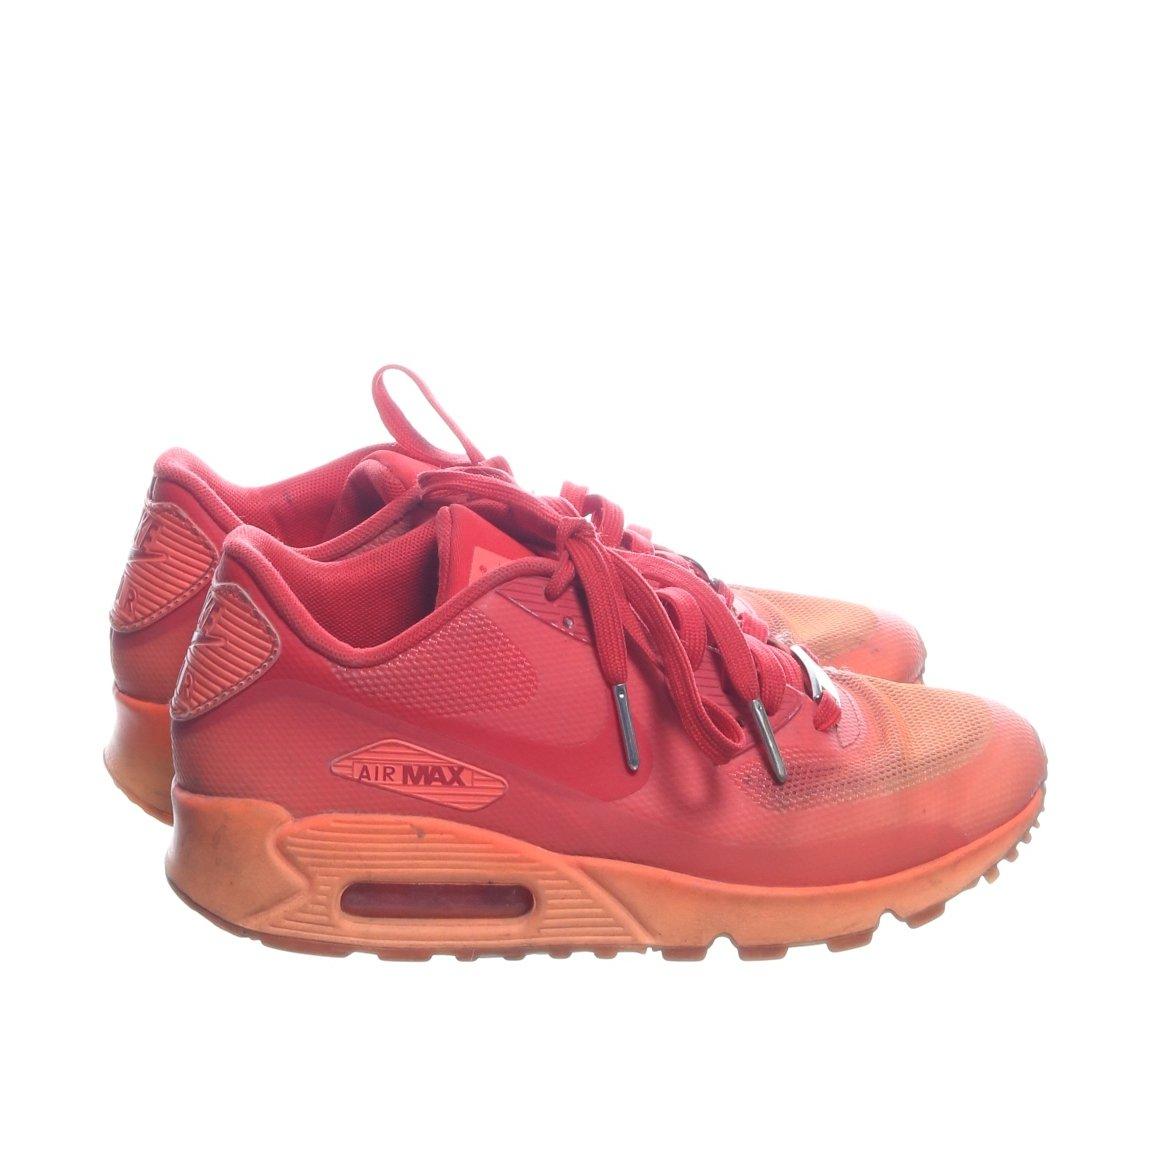 Nike Air Max, Sneakers, Strl: 36 12, Hyp.. (358499441) ᐈ